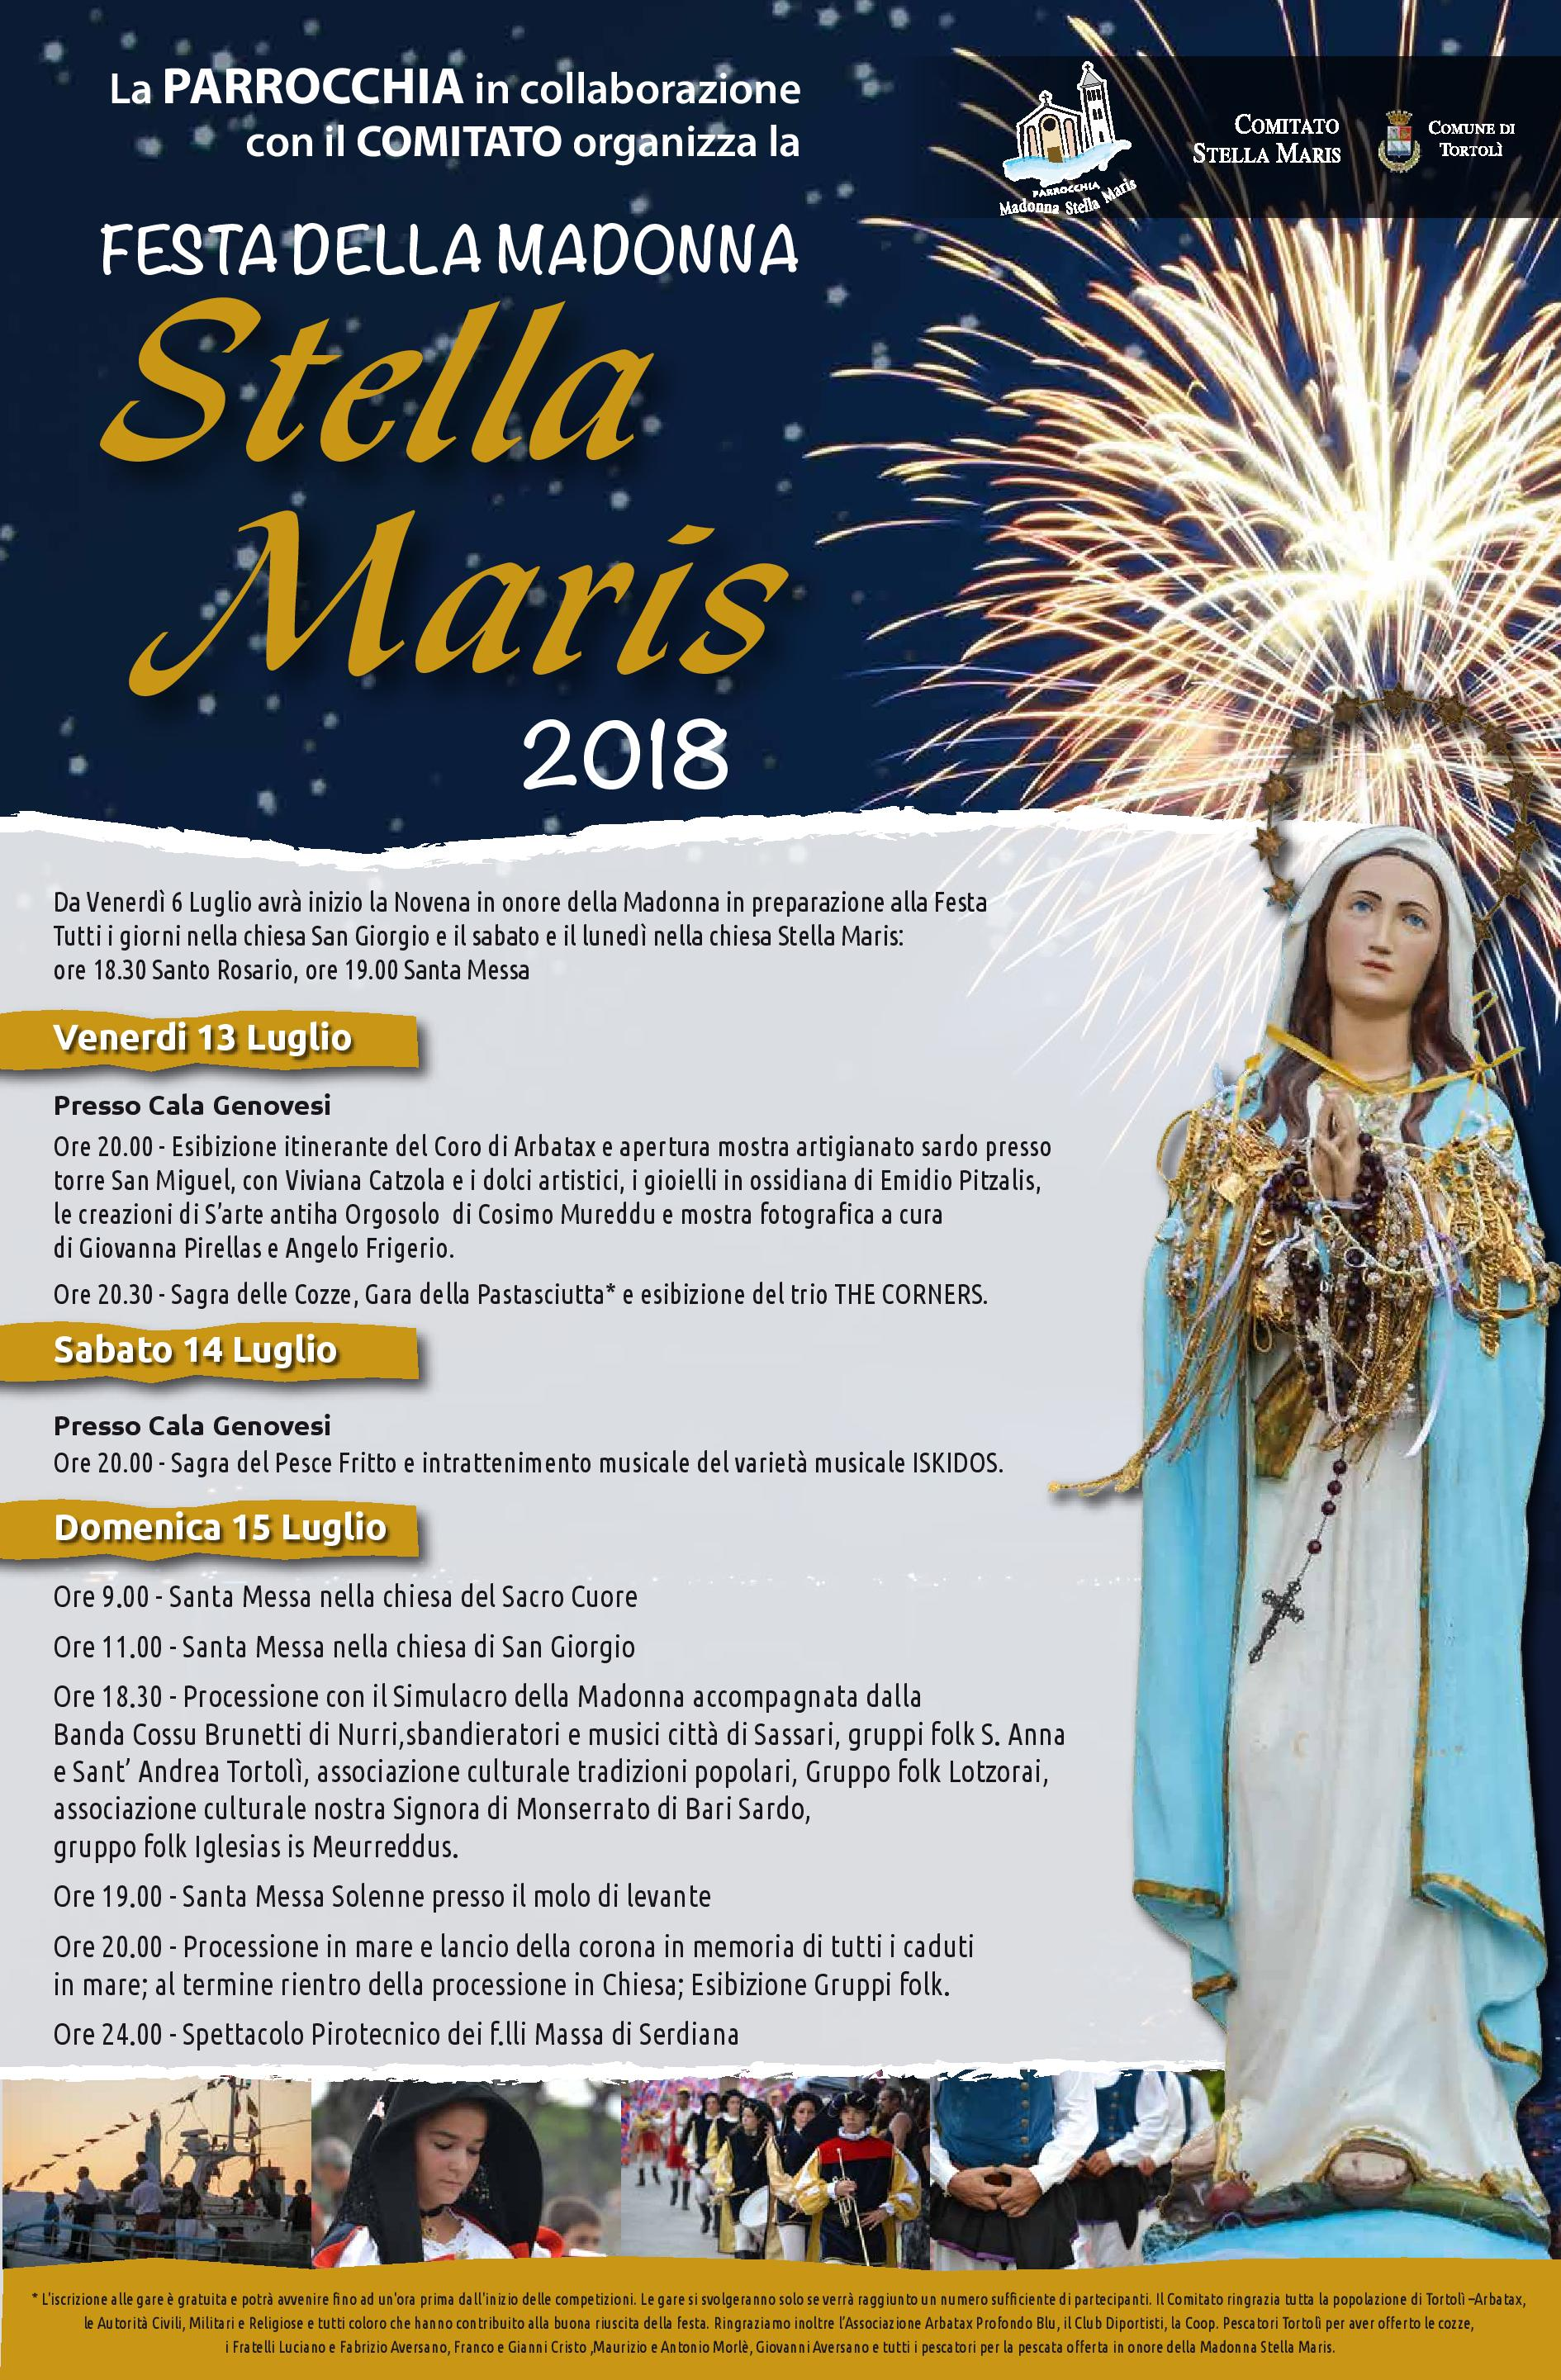 locandina_festa_stella_maris_2018-page-001